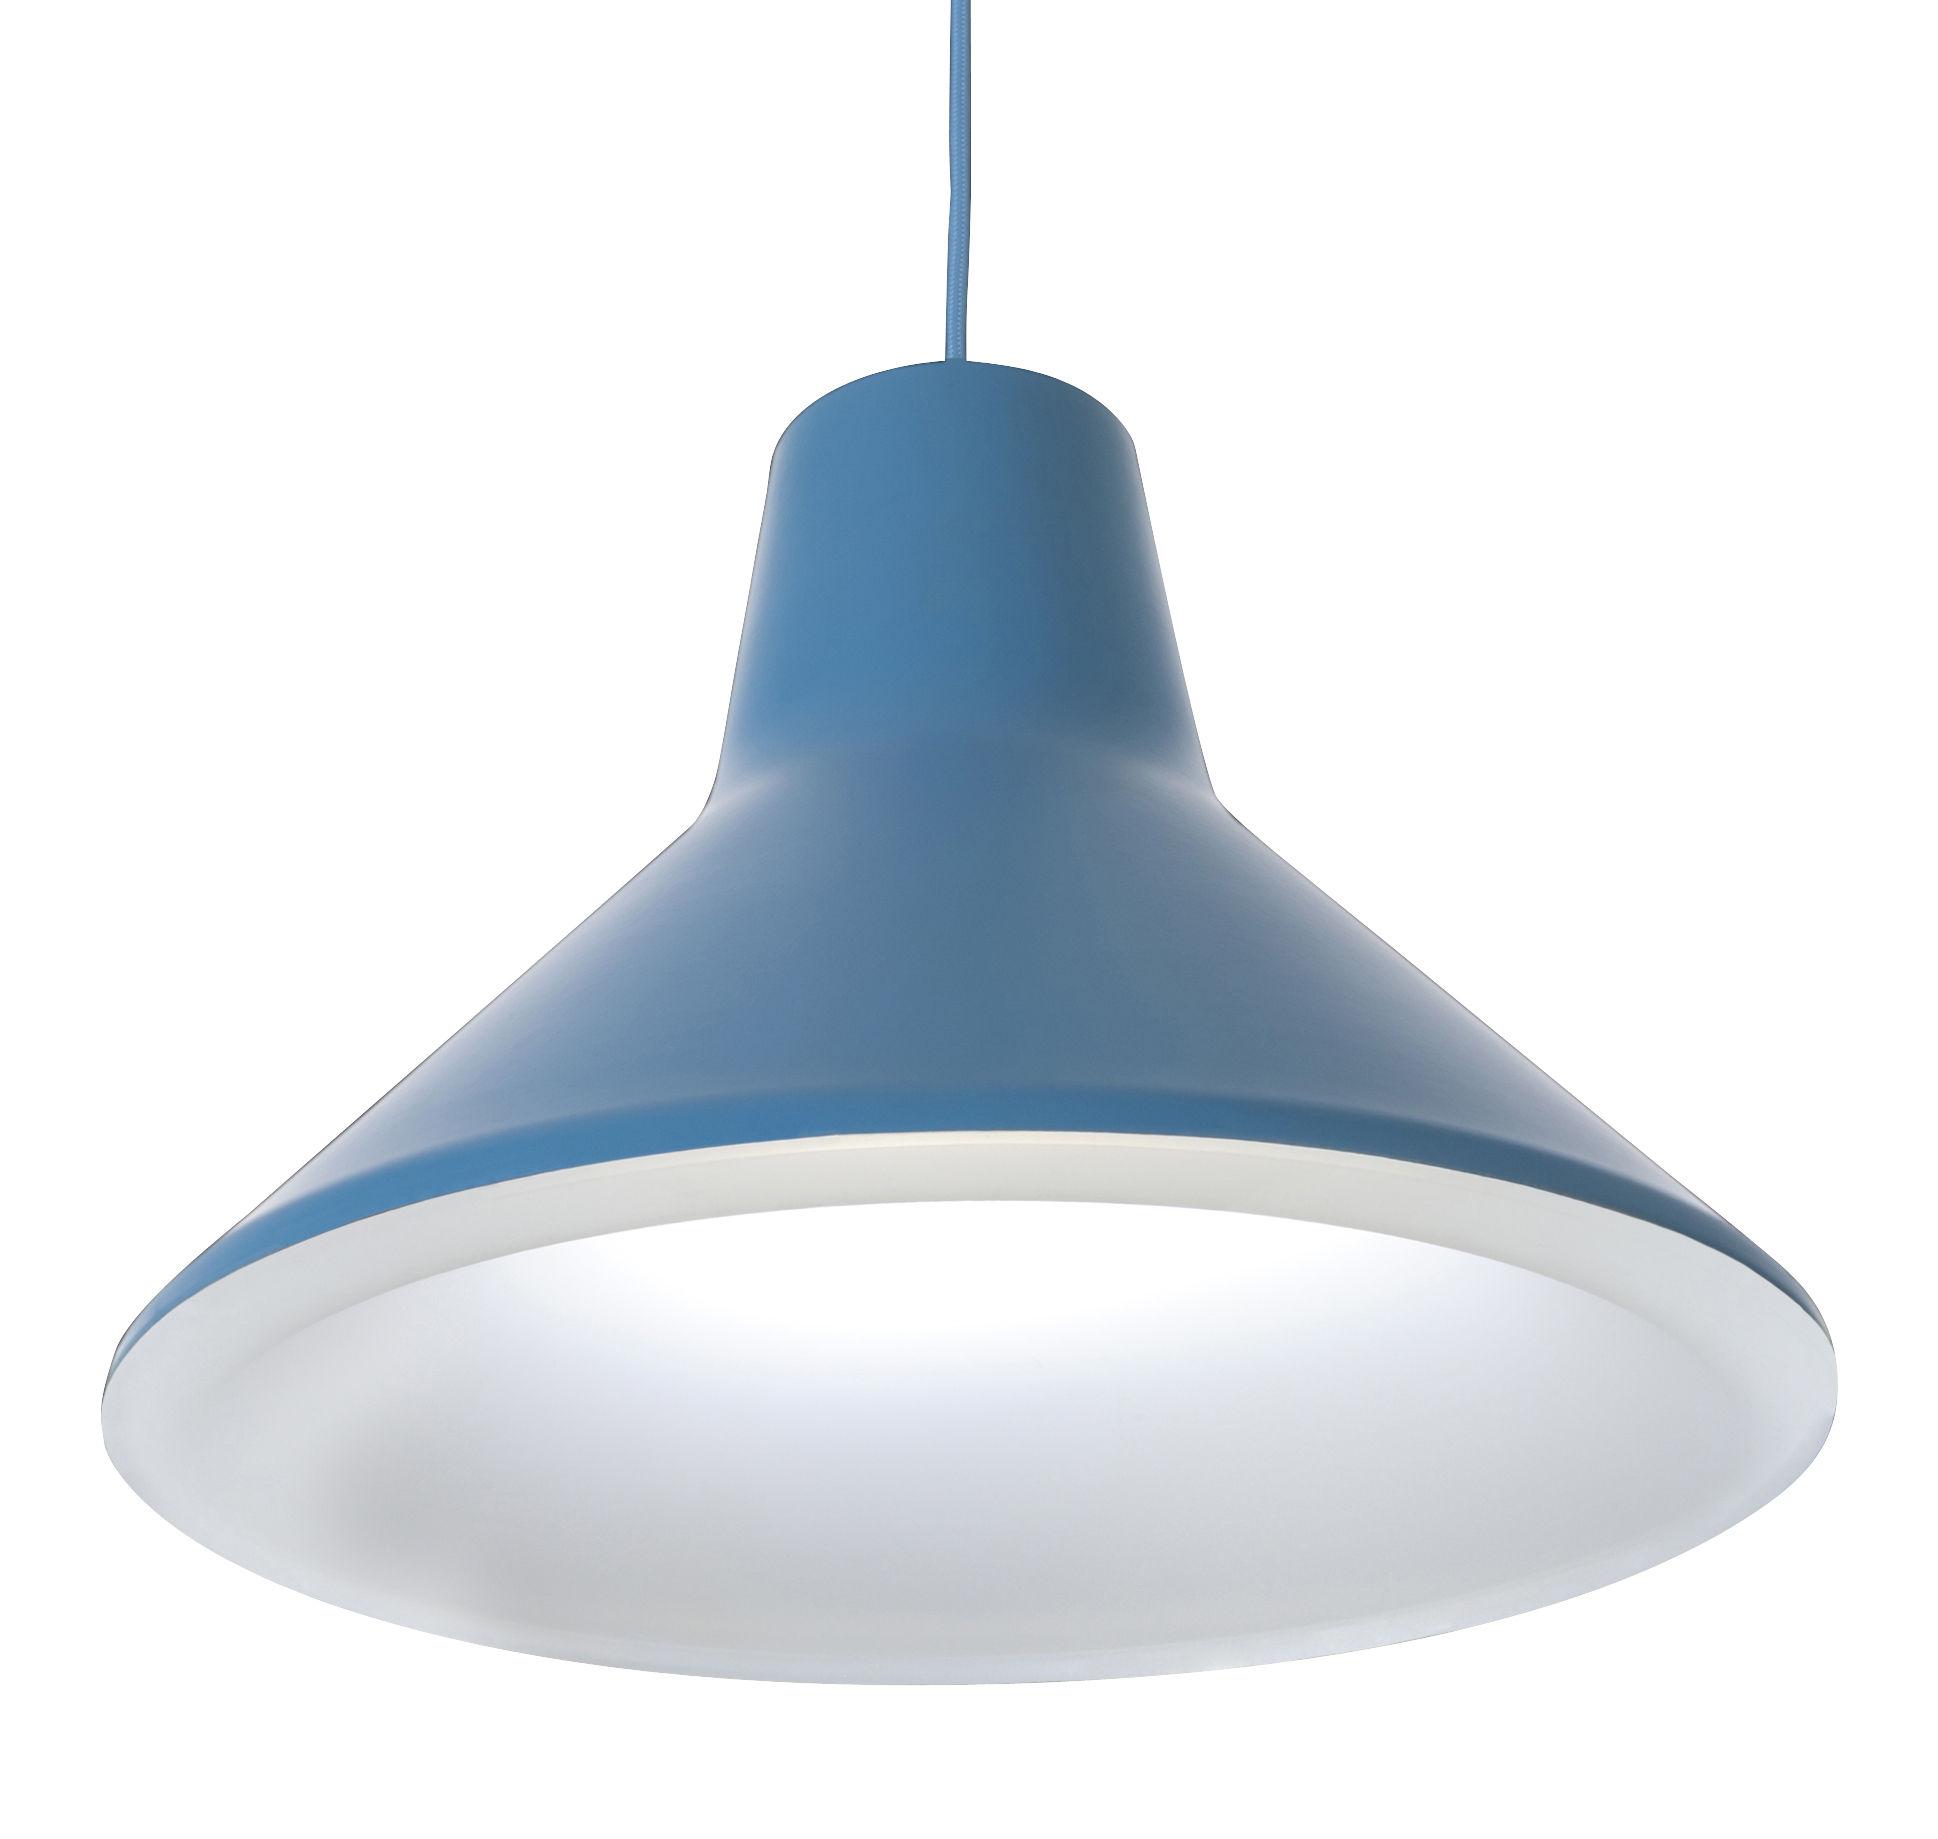 Leuchten - Pendelleuchten - Archetype Pendelleuchte LED - Luceplan - Himmelblau - lackiertes Aluminium, Polykarbonat